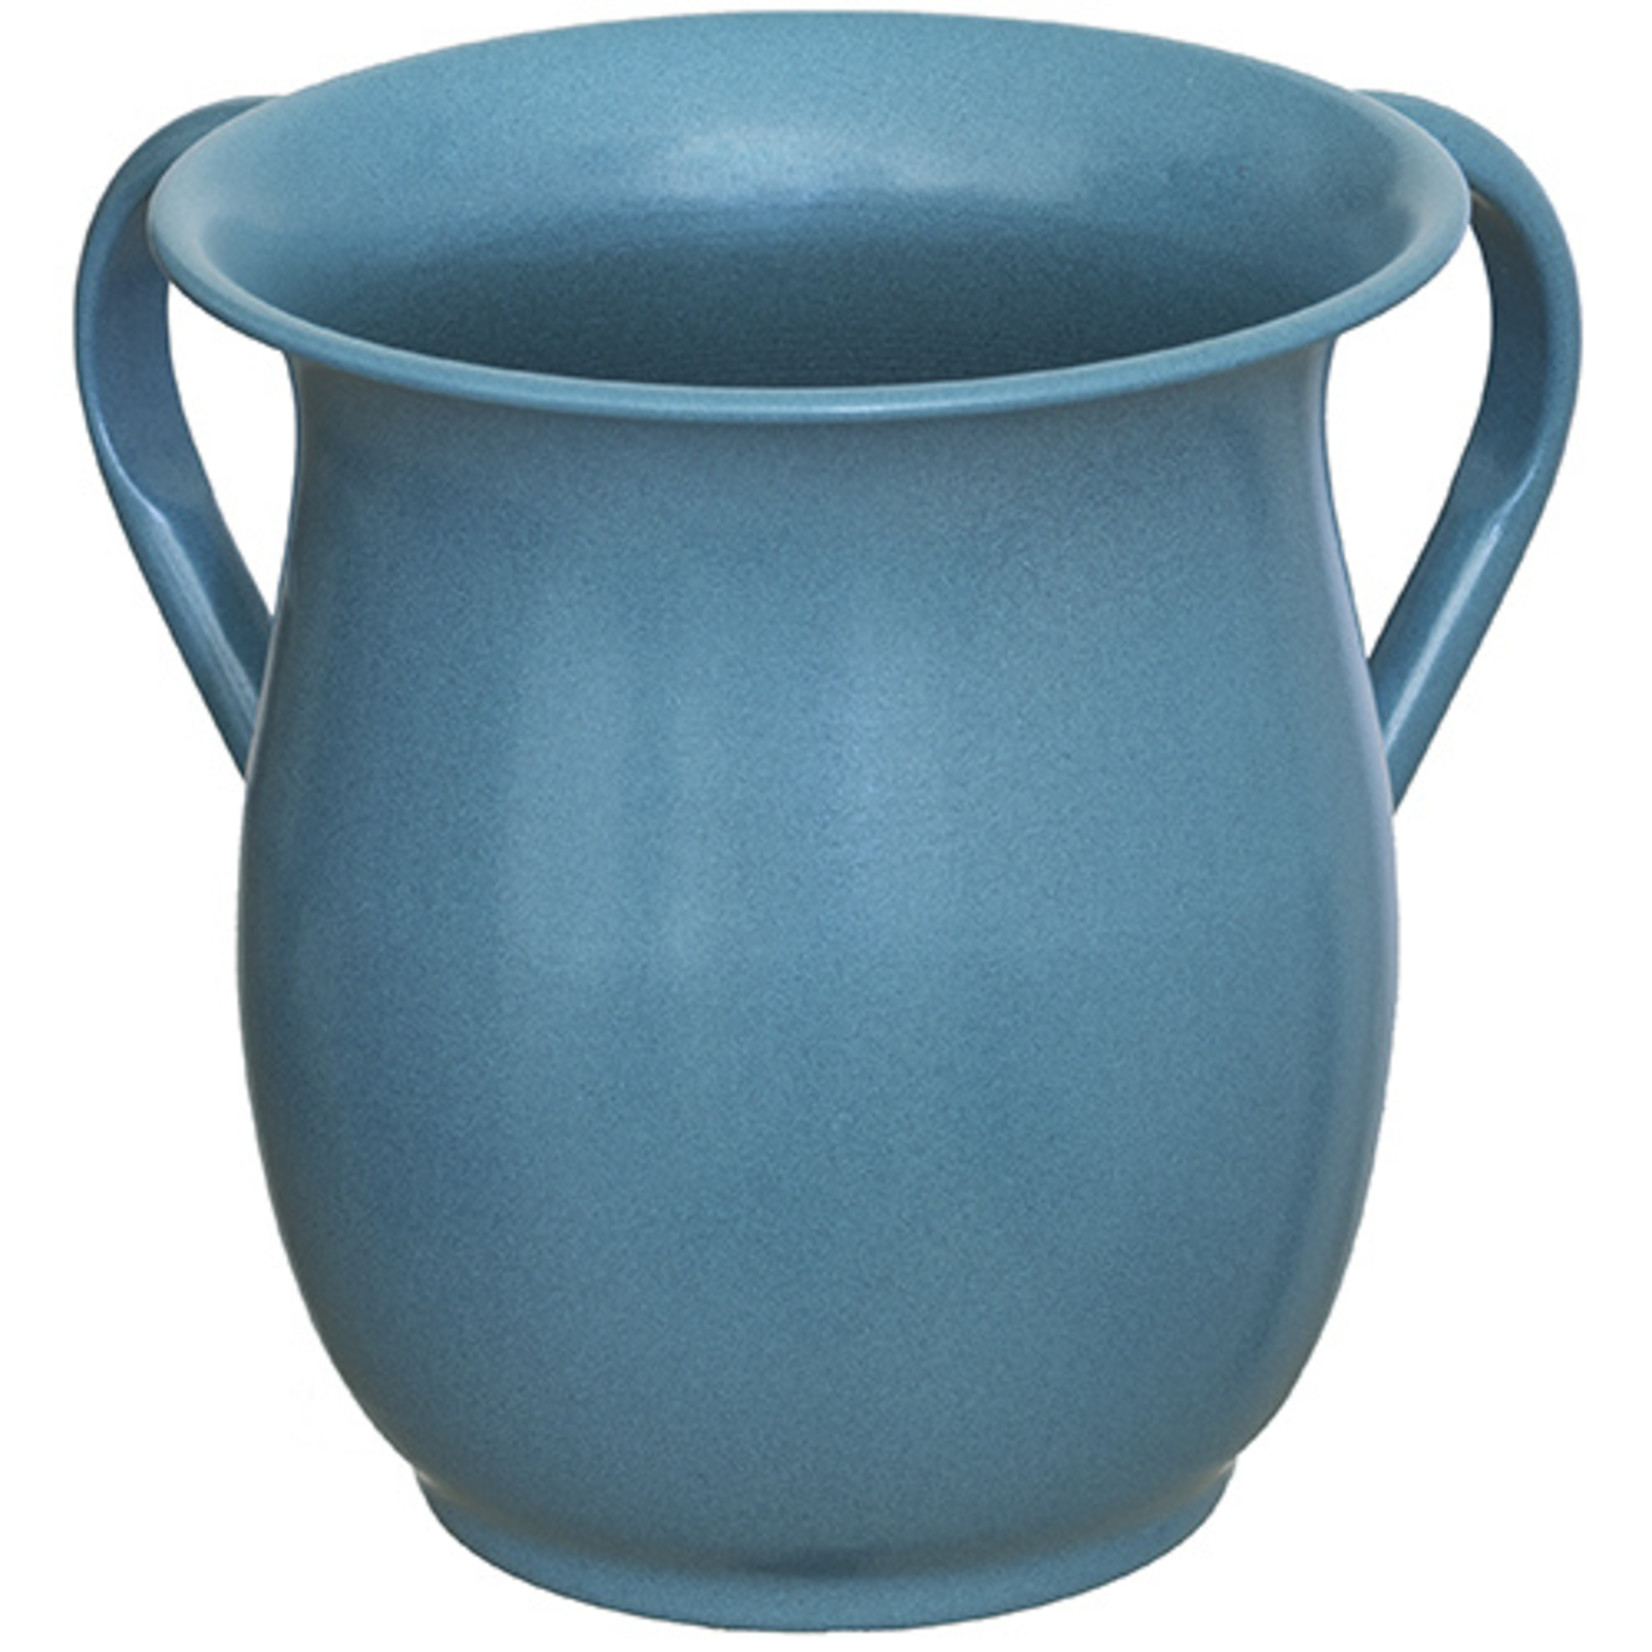 Washing Cup, Aluminum, Turquoise